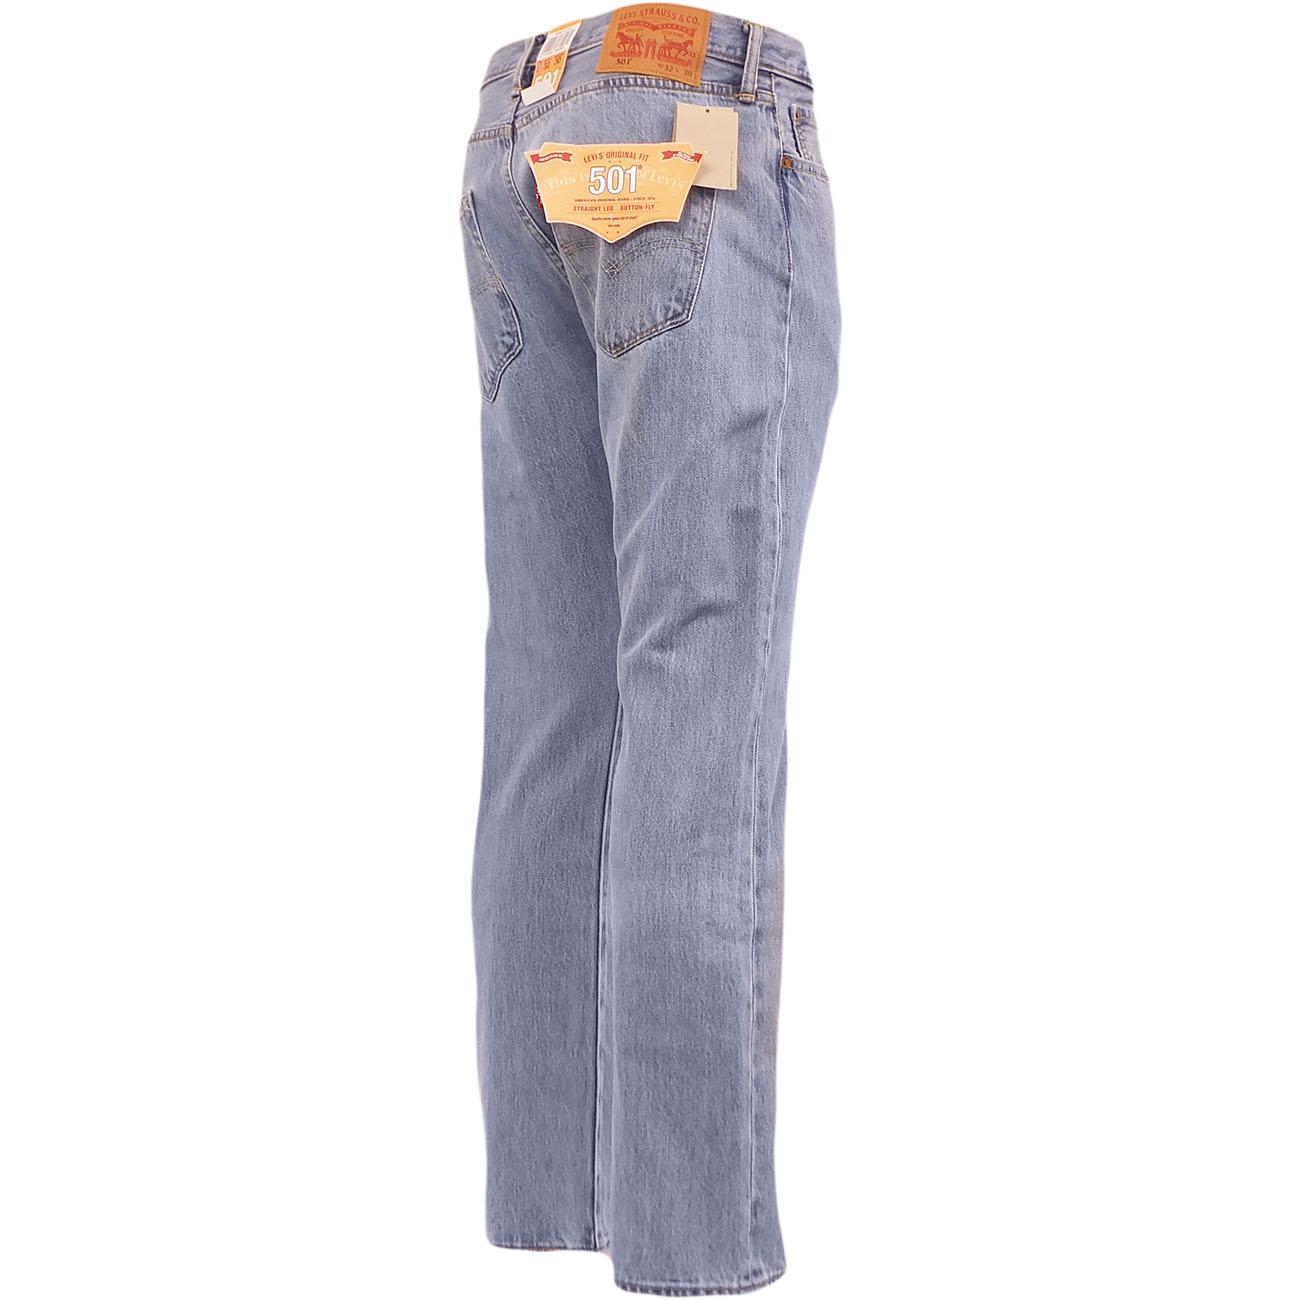 Levis Jeans Jackets Clothing Official Levis Uk